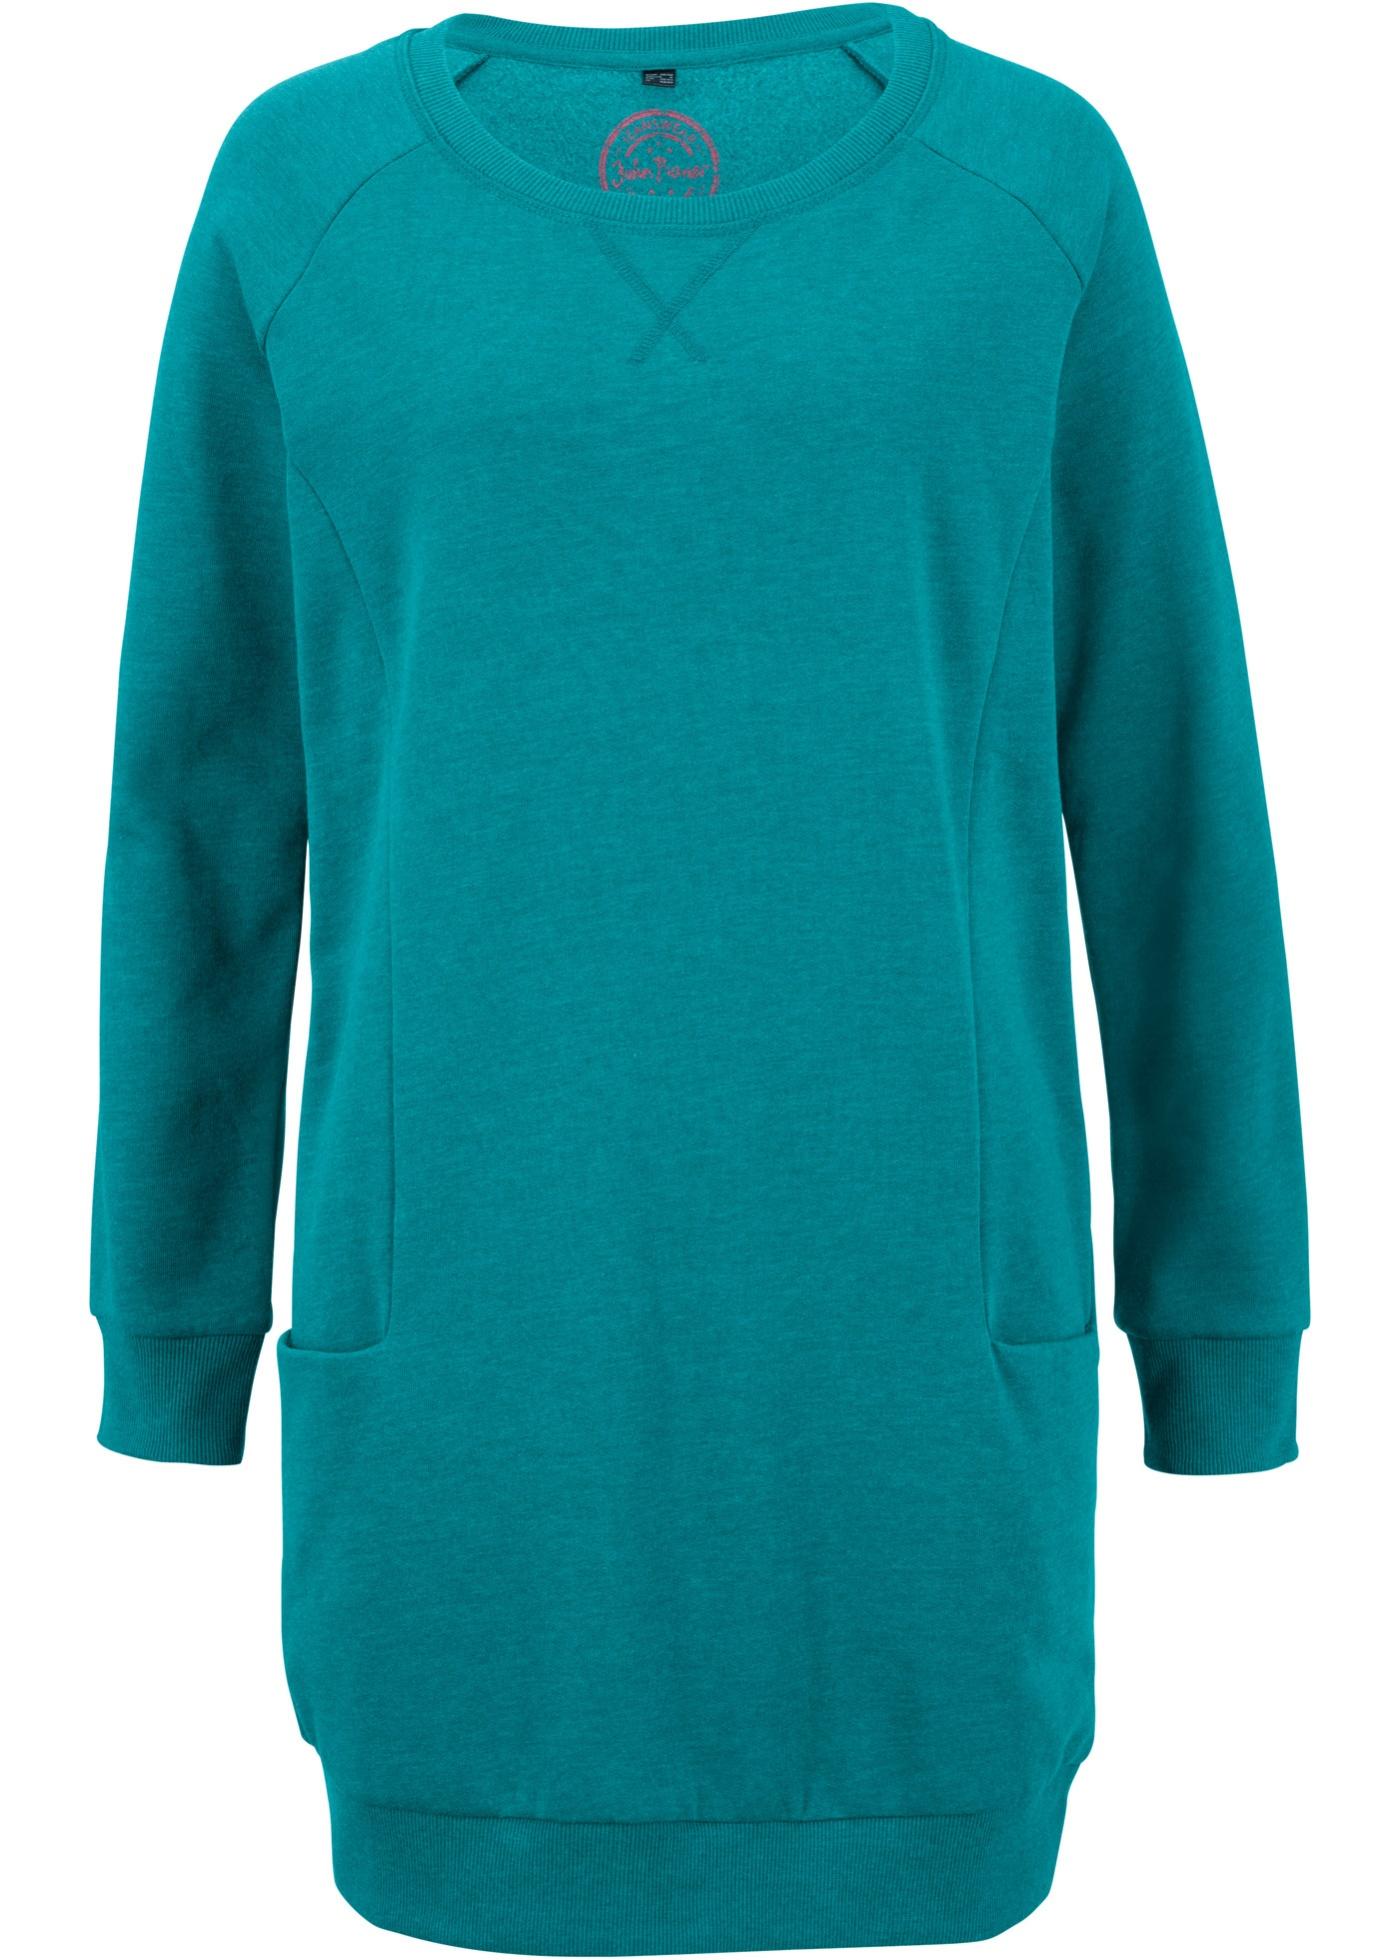 Jeanswear BonprixRobe Sweat D'été shirtManches Femme Longues John Baner Bleu Pour wkiXZuOPT